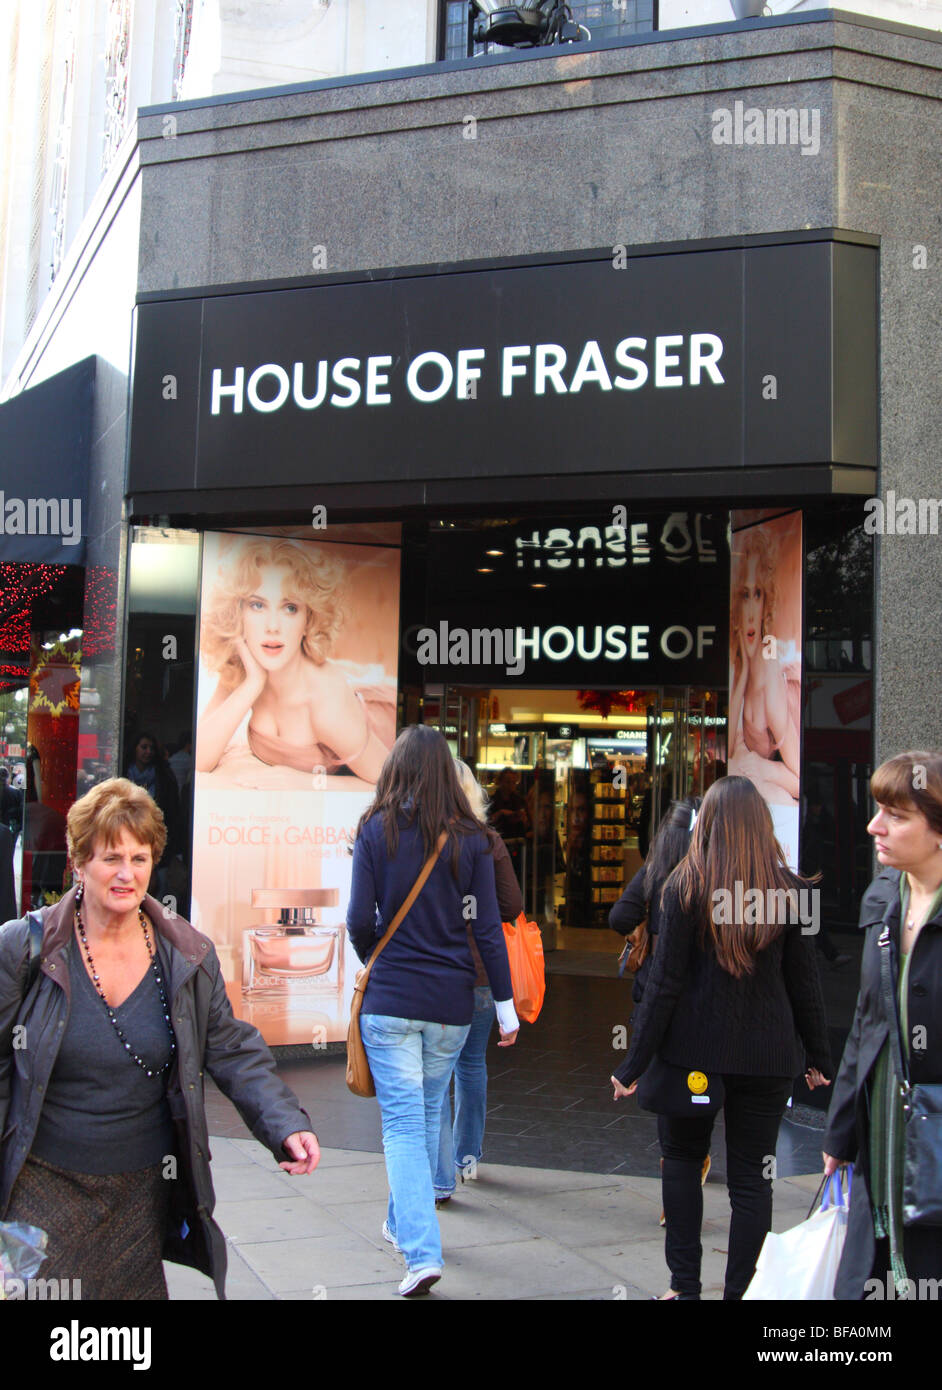 House Of Fraser department store, Oxford Street, London, England, U.K. - Stock Image